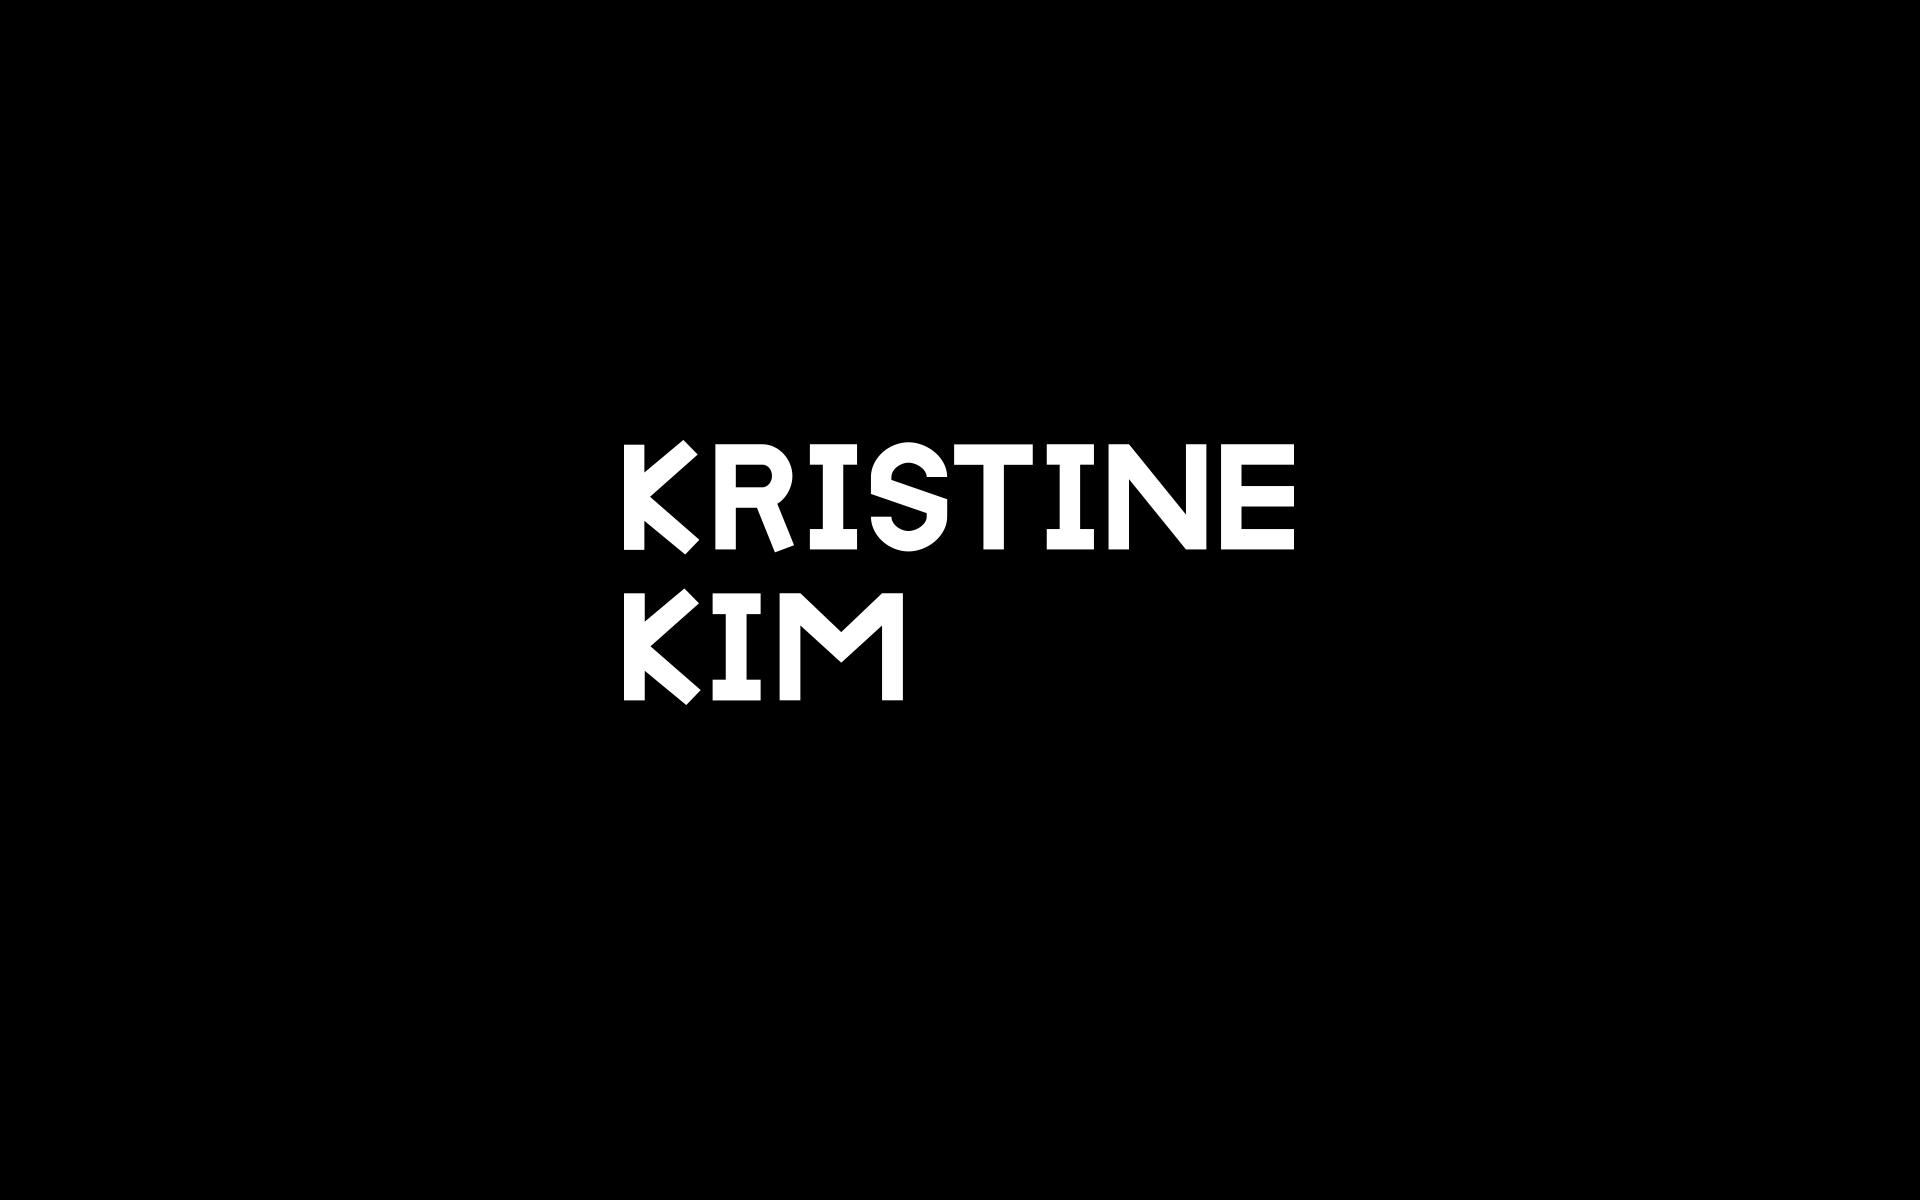 Kristine_v01Wordmark